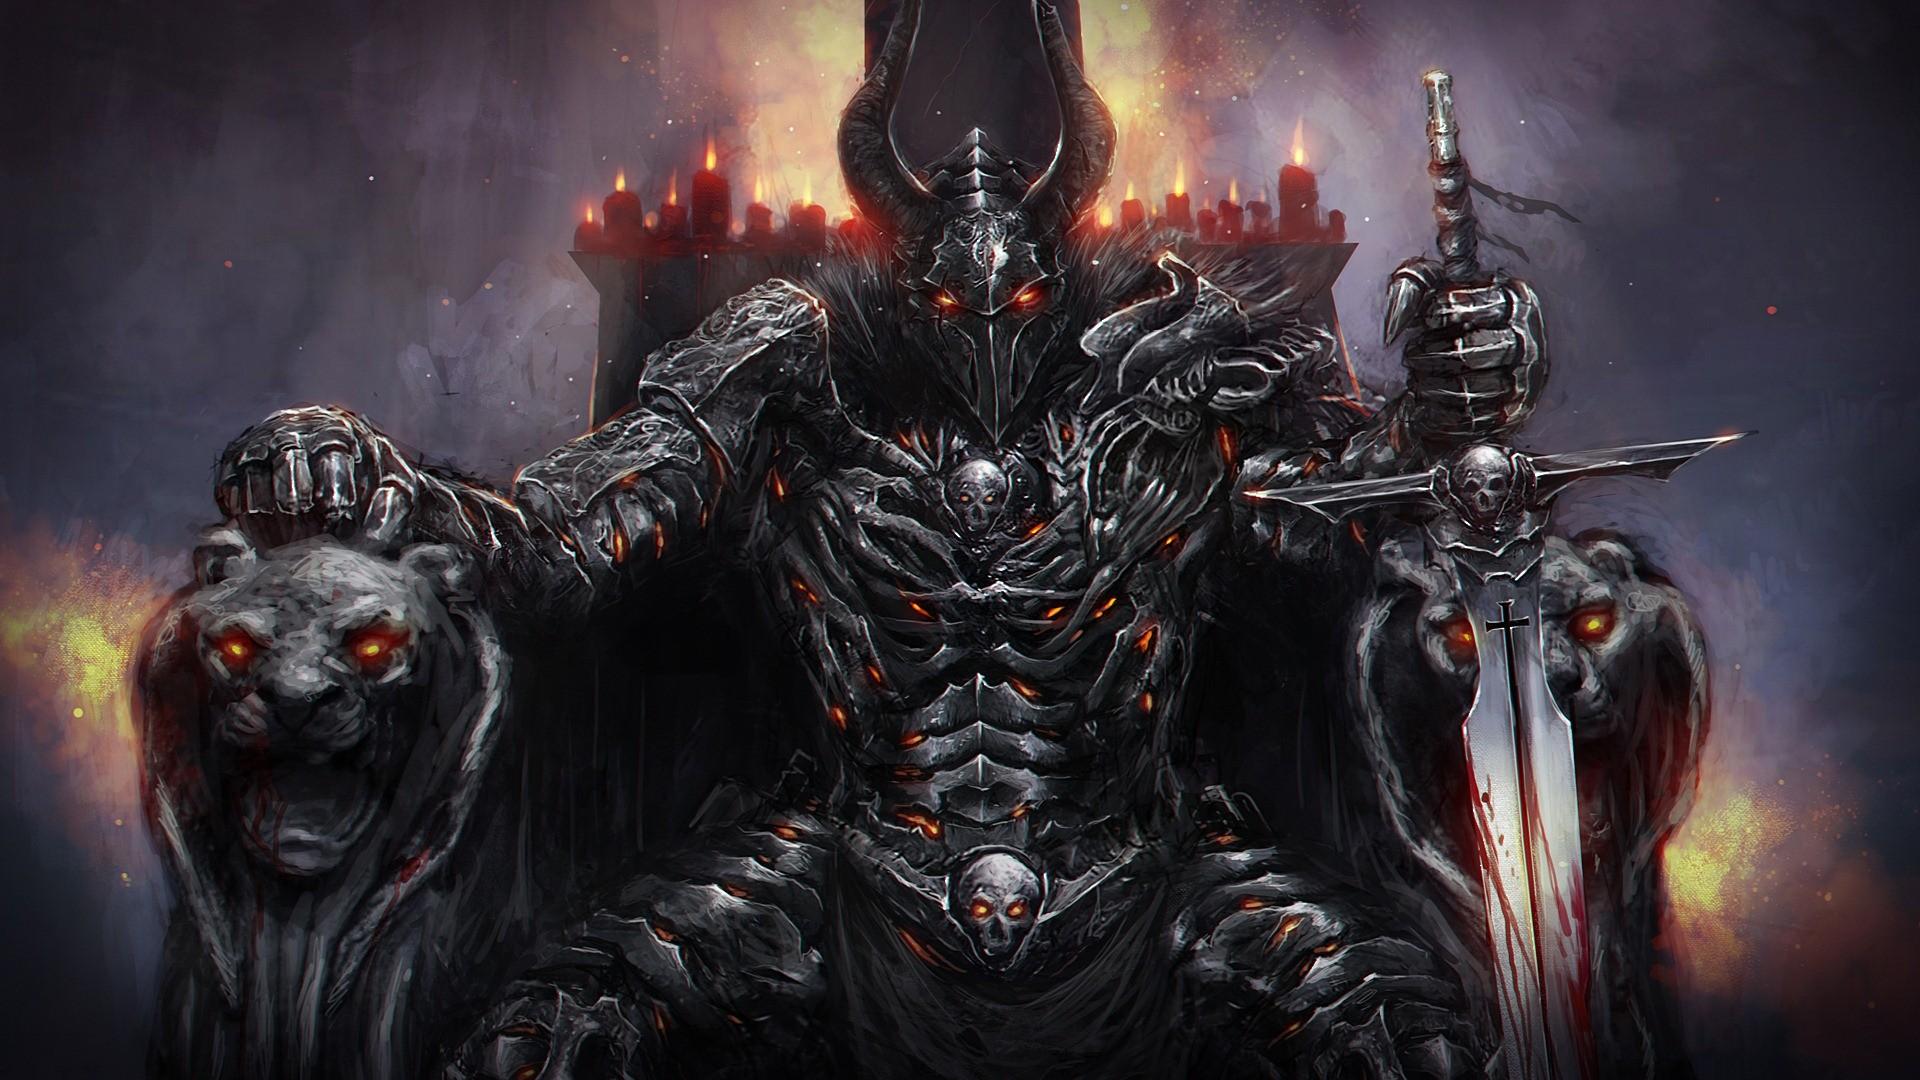 Image – World-of-Warcraft-Fire-King-Mage-Wallpaper.jpg | Fairy Tail Fanon  Wiki | FANDOM powered by Wikia